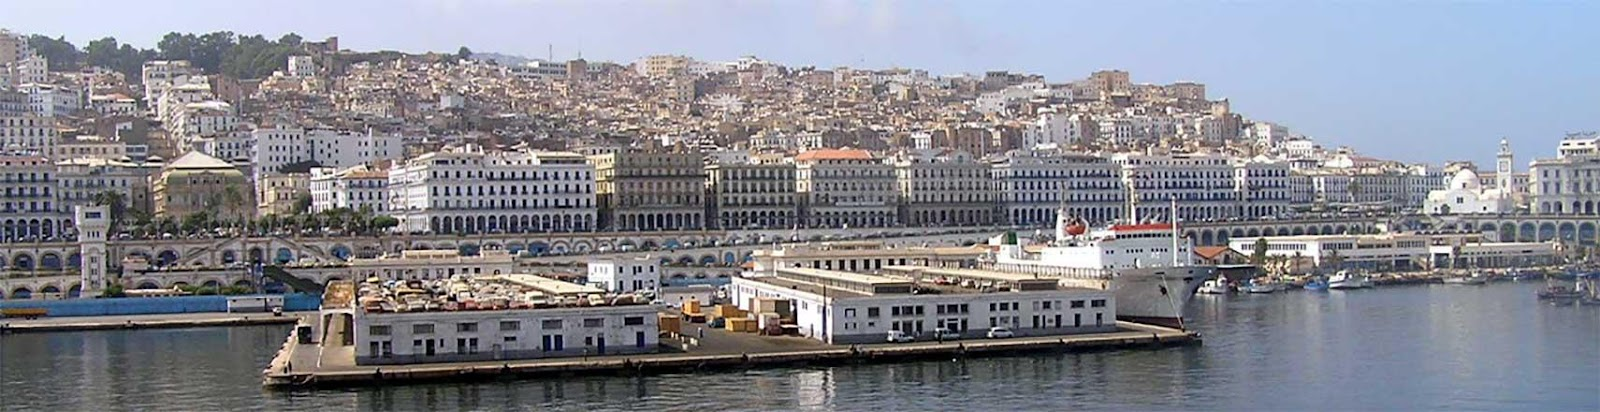 C:\Users\MOURAD\Desktop\Algiers-water-front.jpg